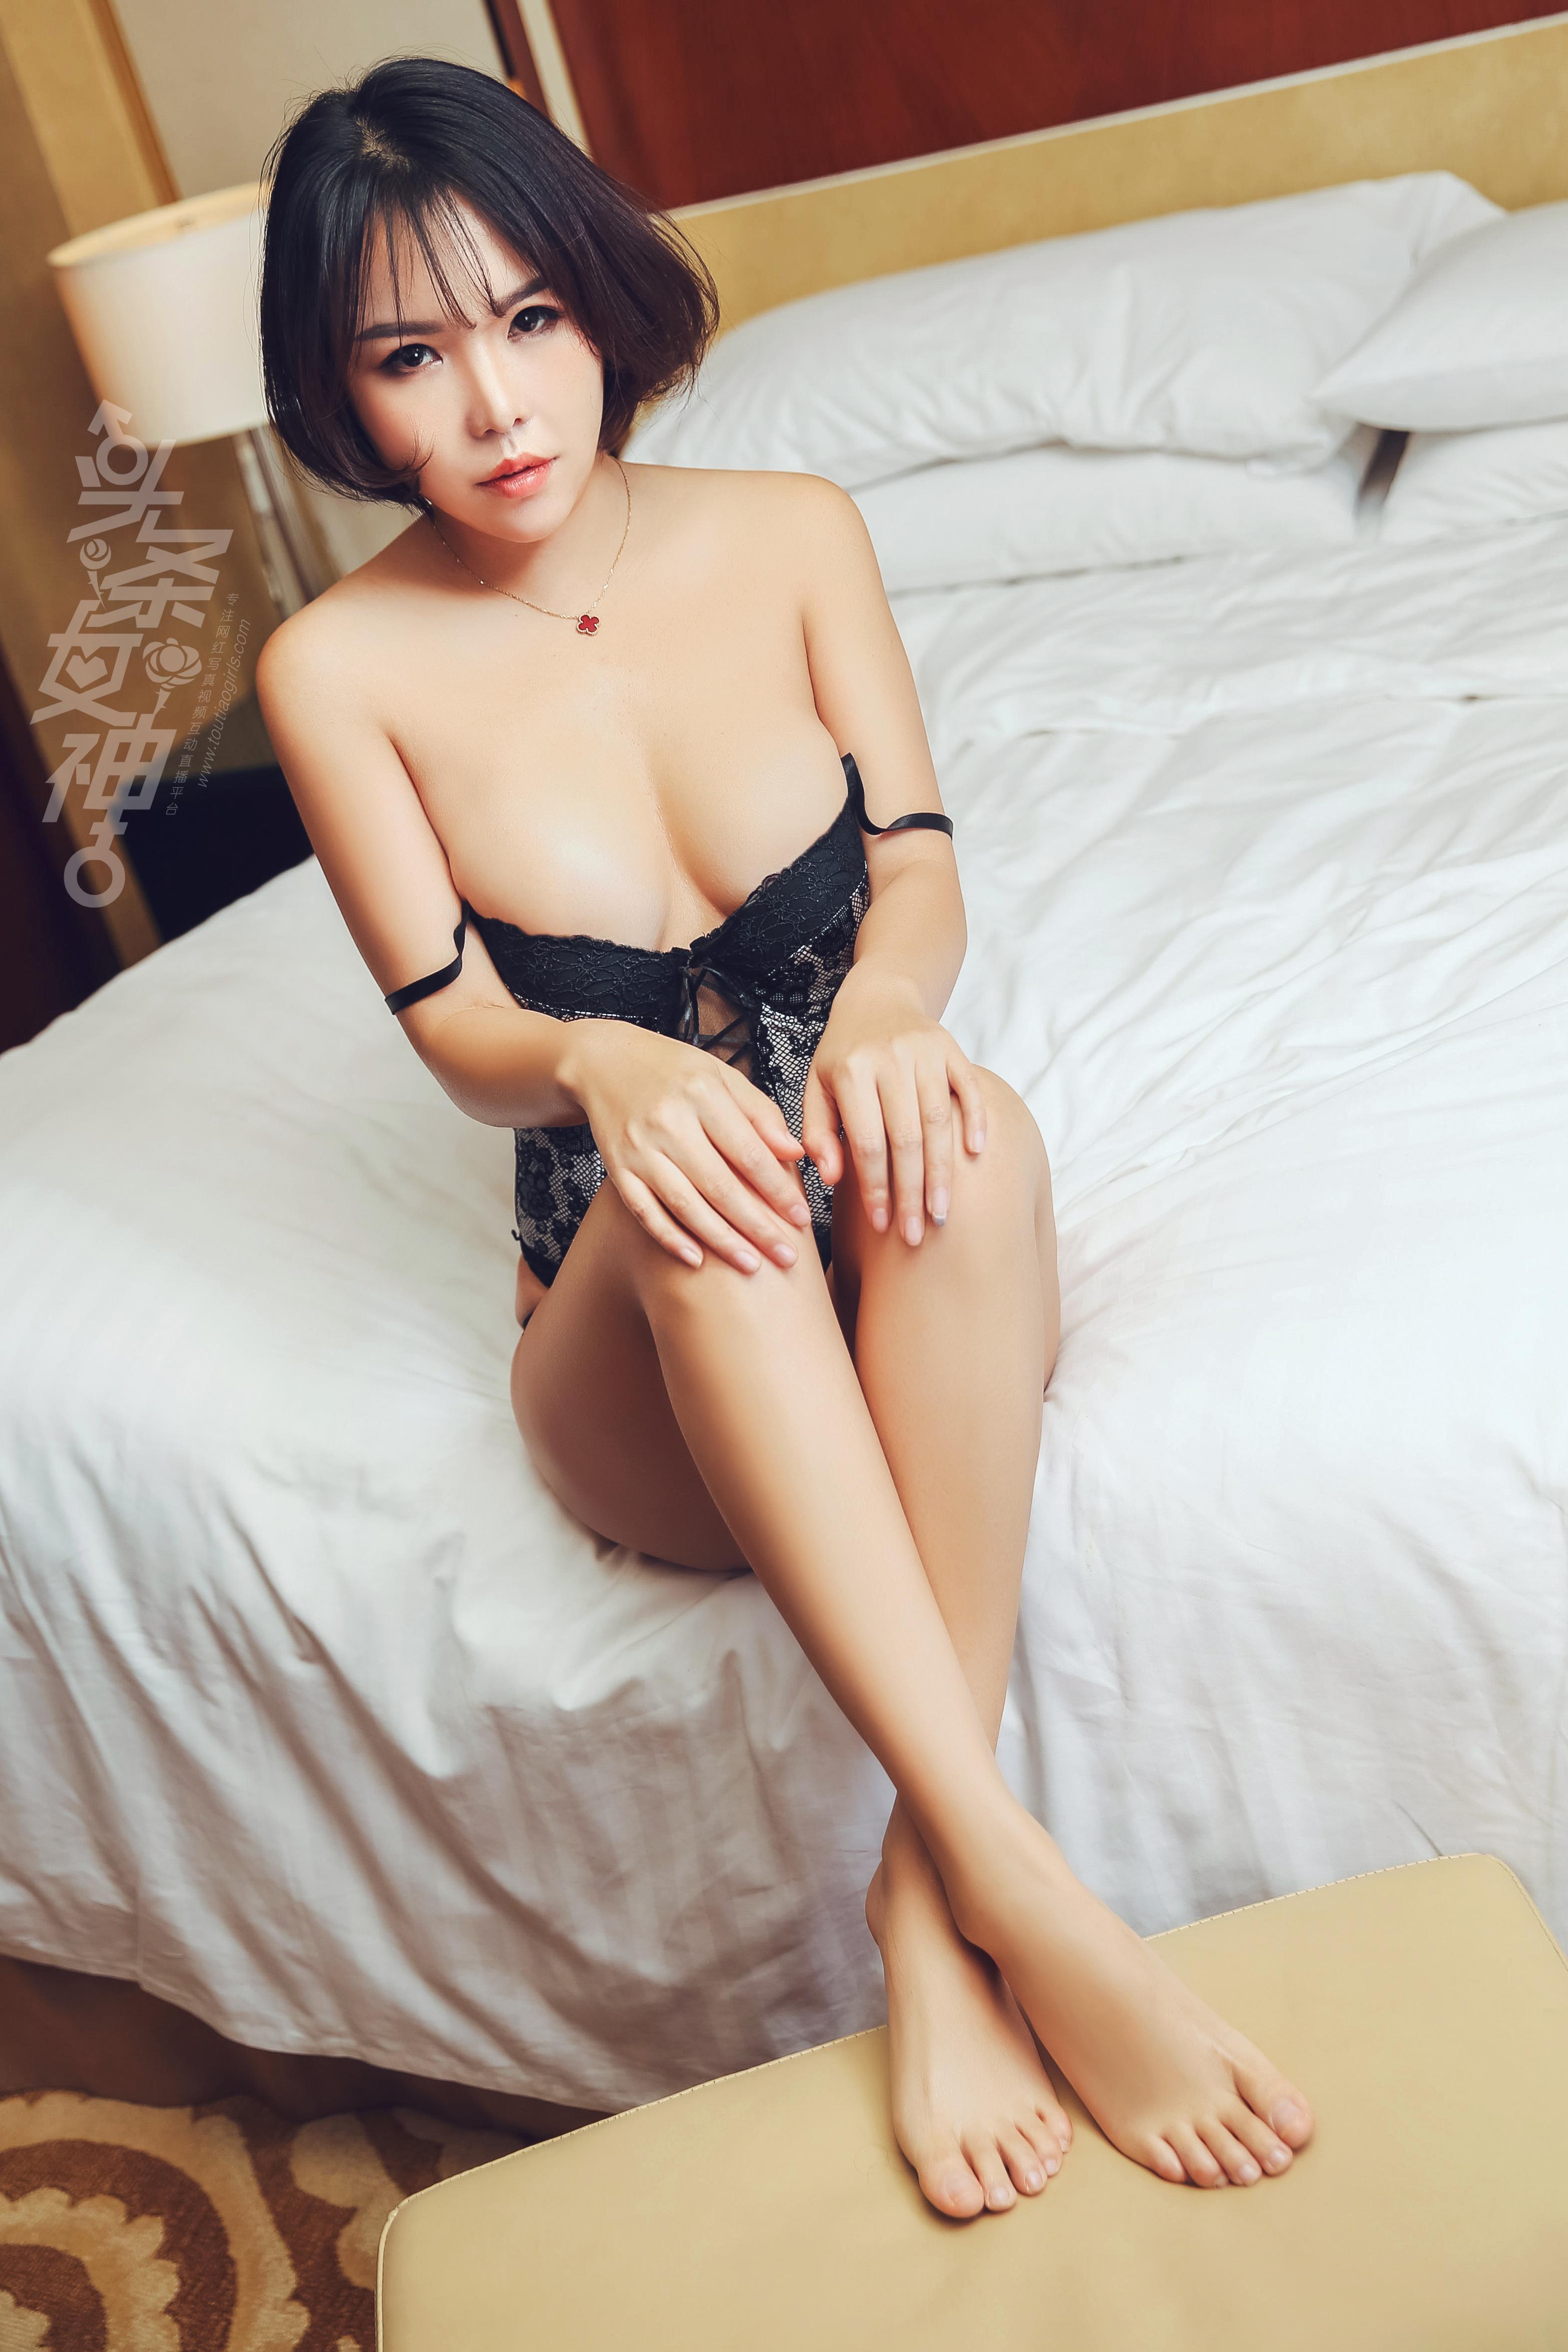 hot Chinese woman in sexy pose - 아담한 몸매에 작고 갸름한 달갈형 얼굴. 은근한 매력이 지속되는 대륙의 여인네